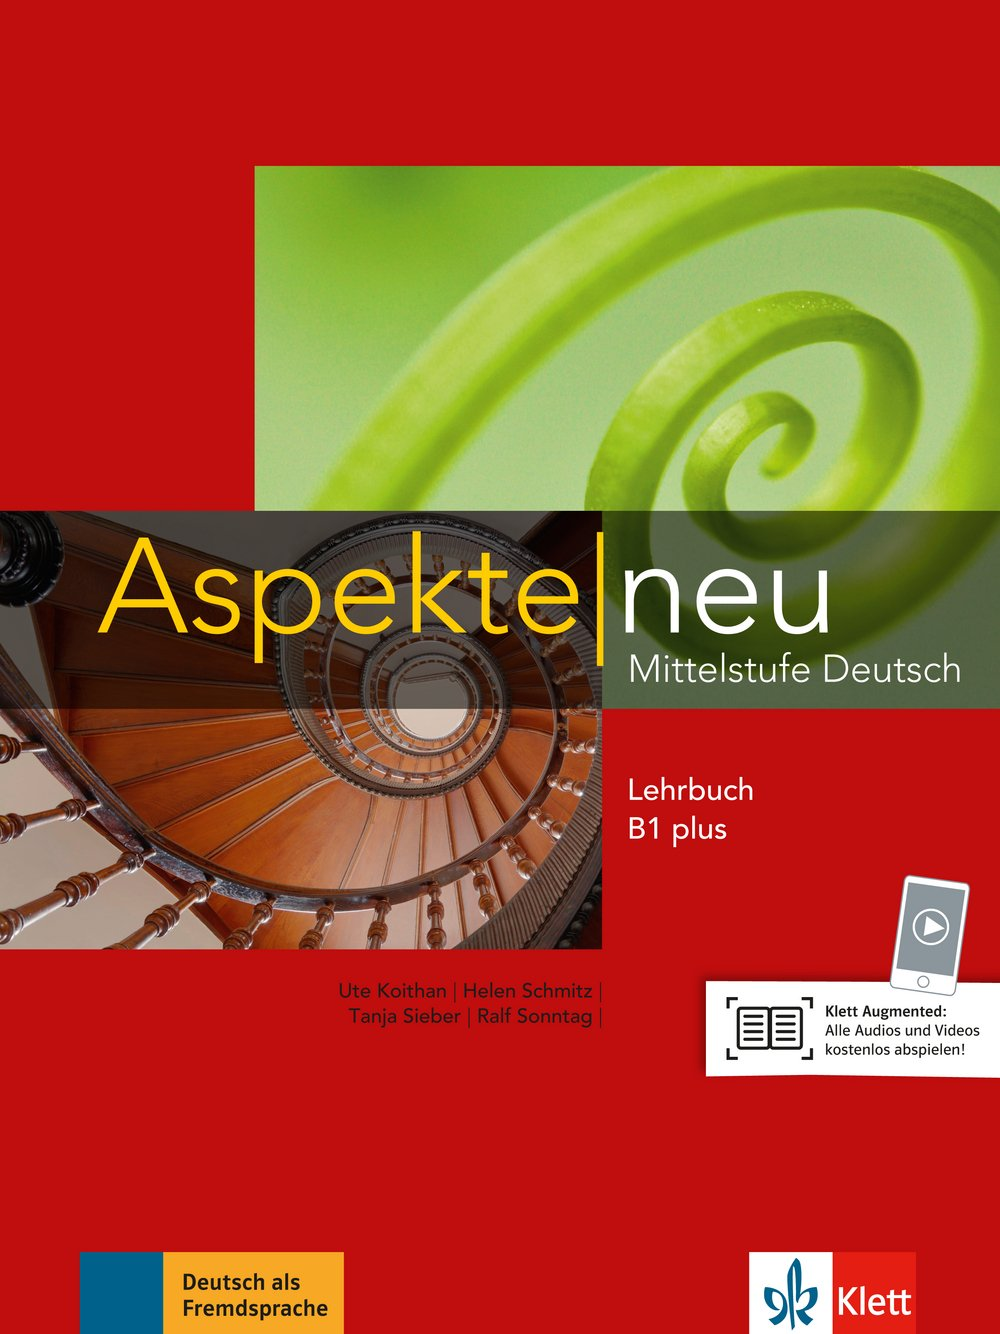 Aspekte neu B1 plus: Mittelstufe Deutsch. Lehrbuch